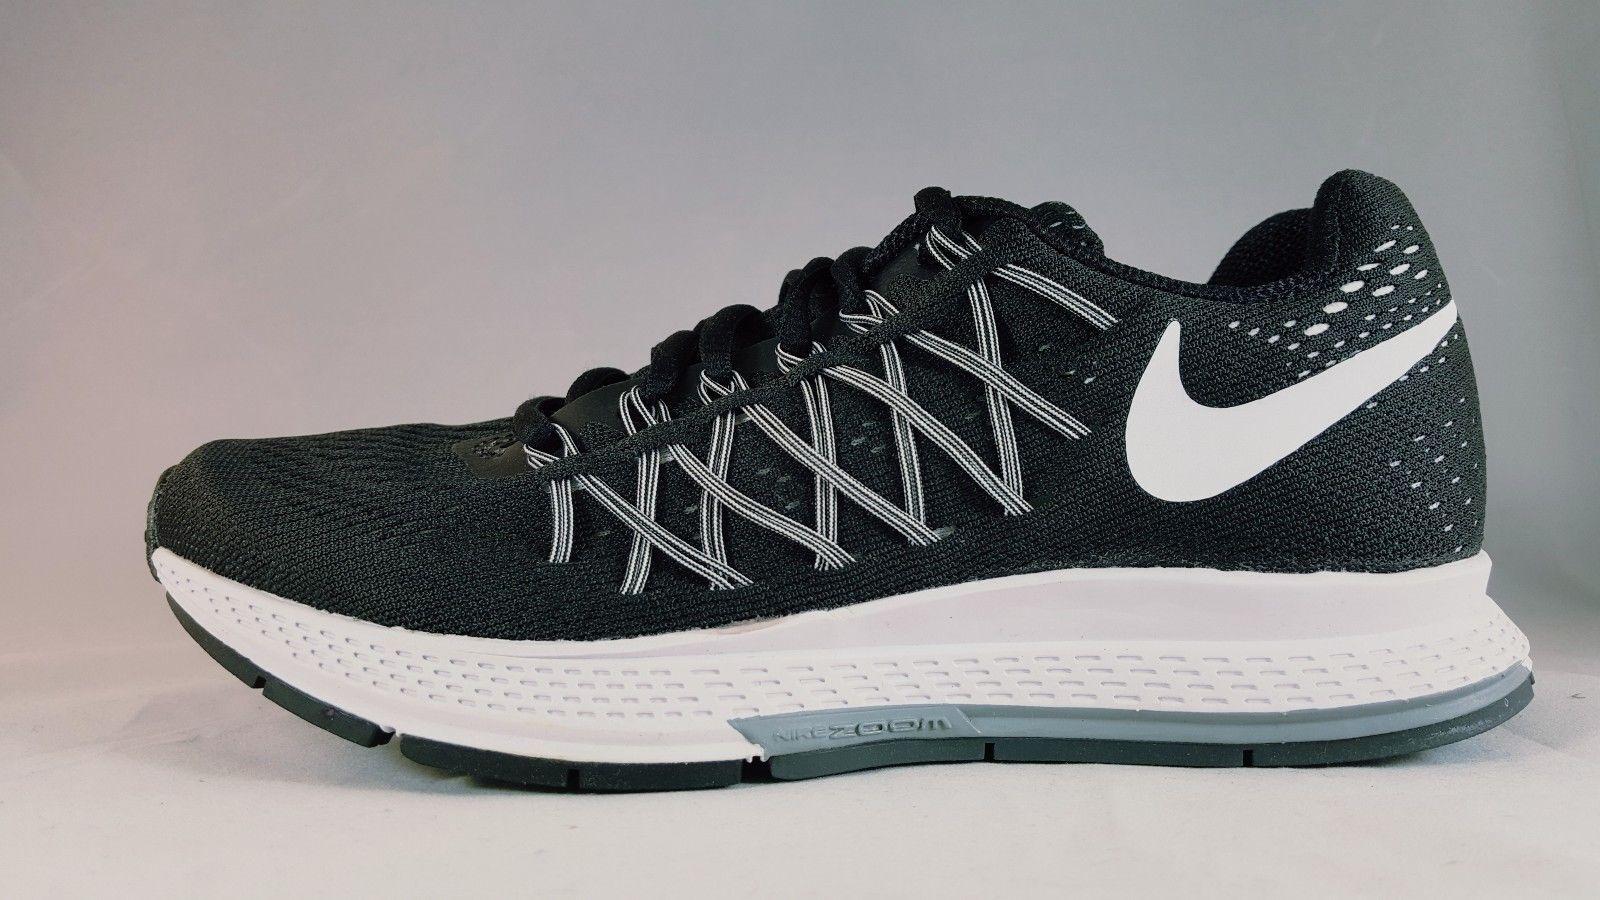 Nike Air Zoom  Pegasus 32 Wouomo Athletic scarpe 74344 Dimensione 12  economico in alta qualità